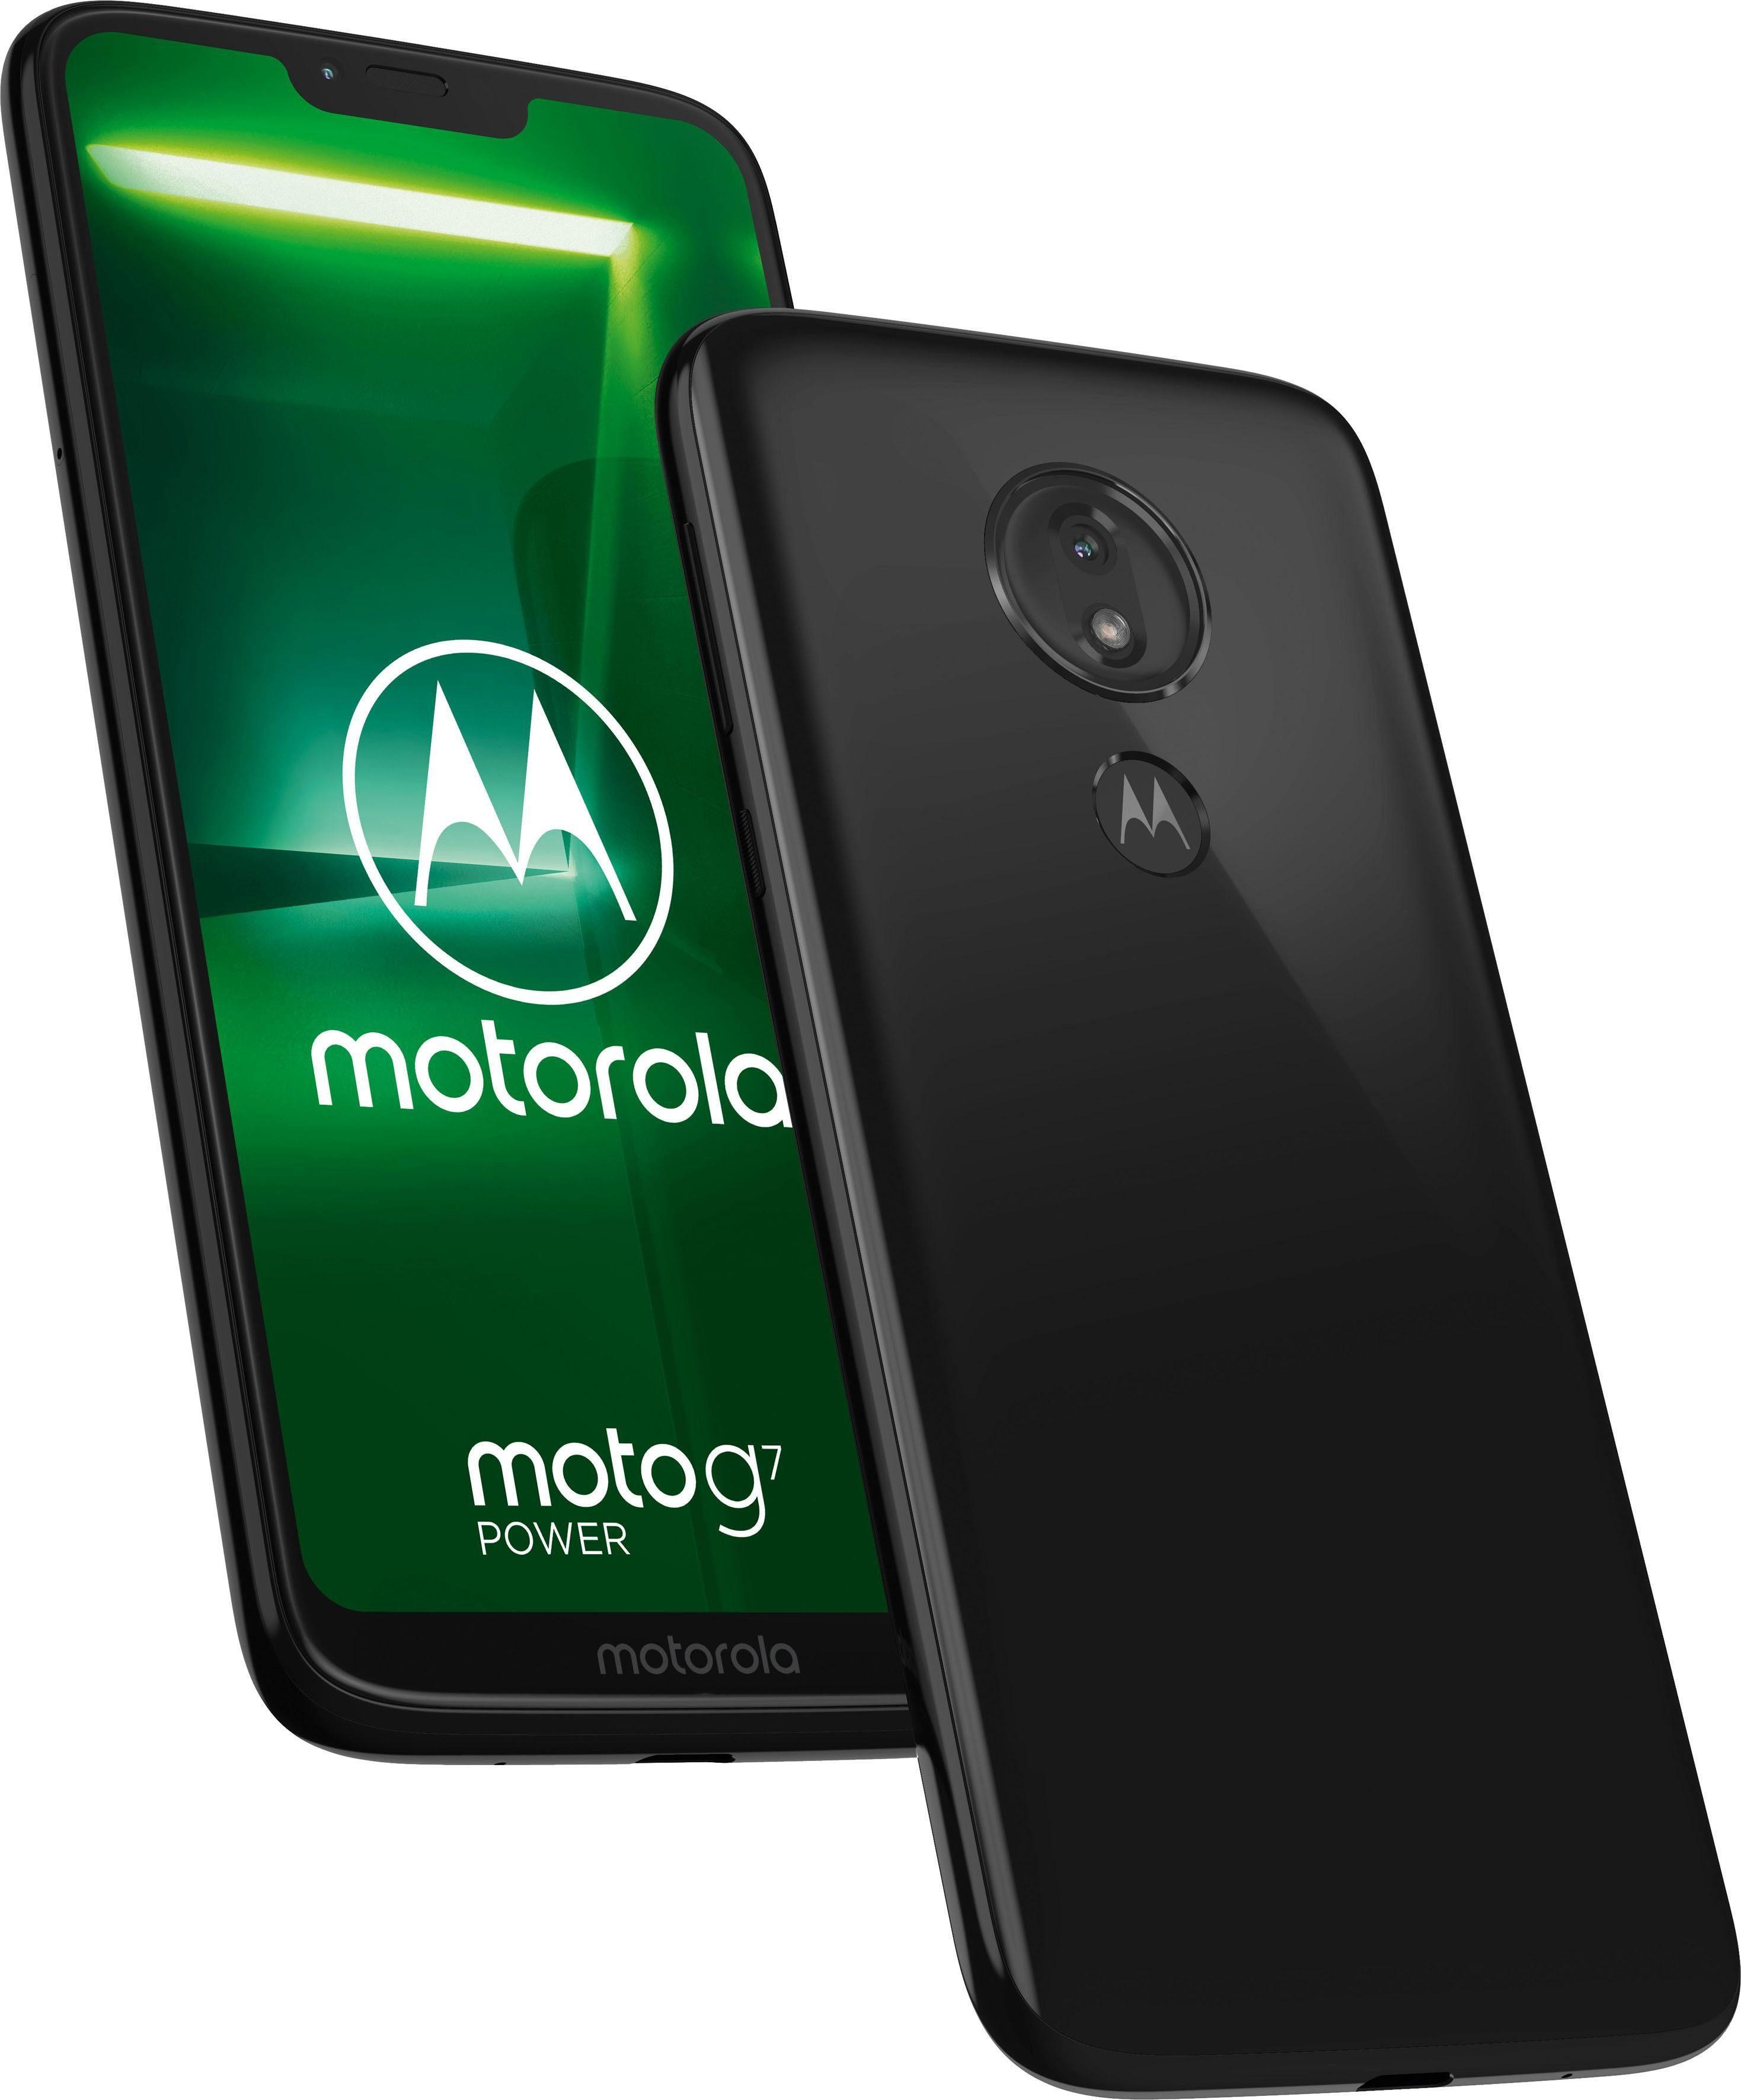 Motorola moto G7 power Smartphone (15,84 cm/6,2 Zoll, 64 GB Speicherplatz)